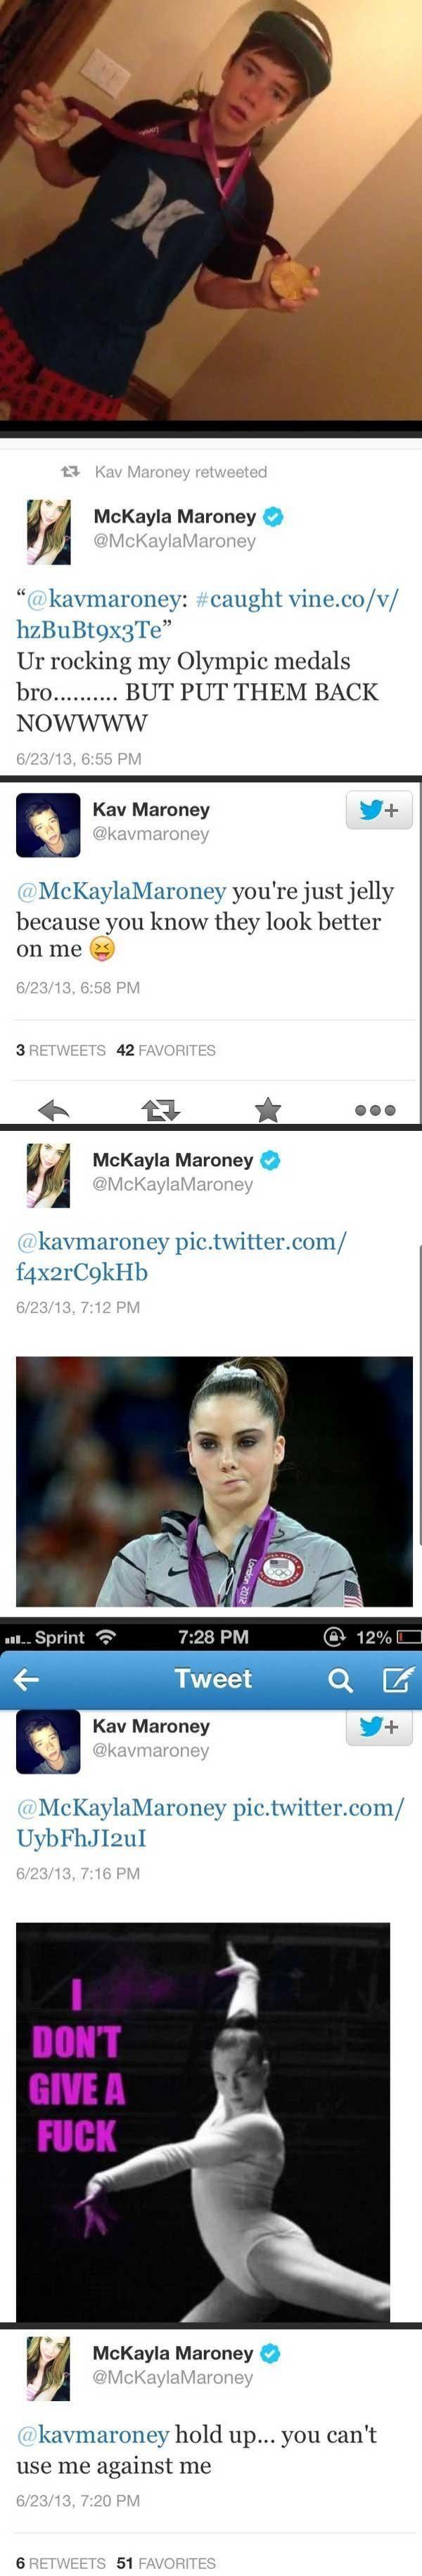 McKayla Maroney vs Her Brother